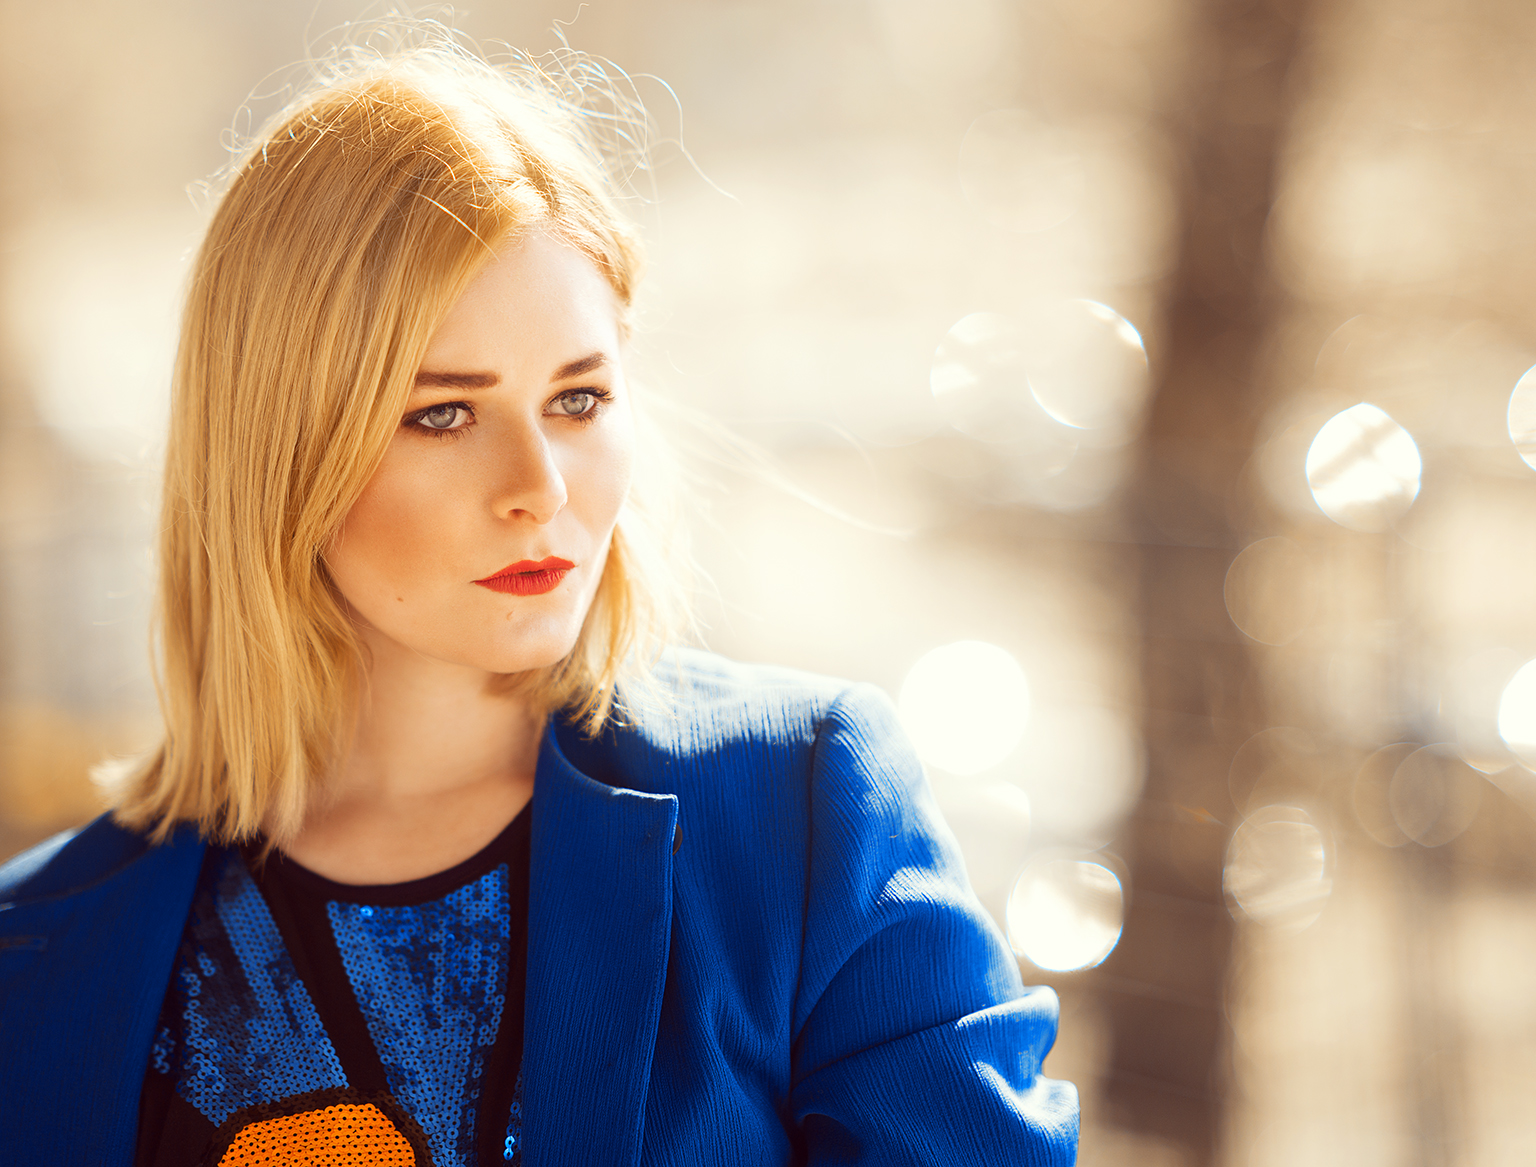 portrait-christina-key-mit-blauem-blazer